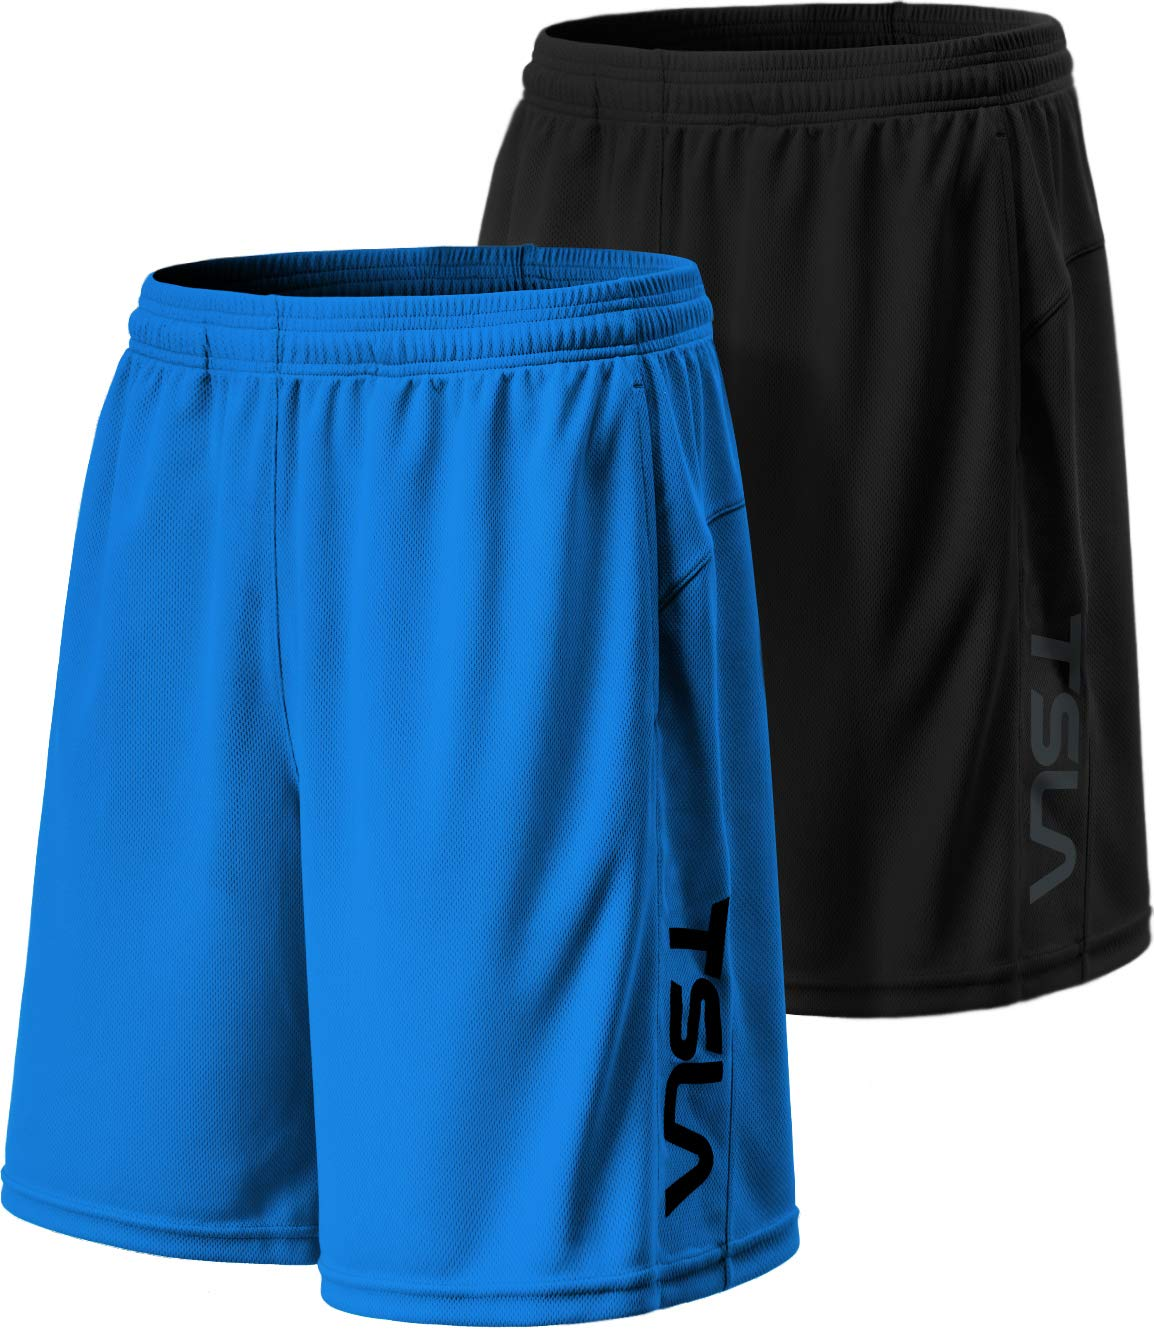 TSLA Men's HyperDri Cool Quick-Dry Active Lightweight Workout Performance Shorts (Pack of 2), Hyper Dri Dual Pack(mbh22) - Black/Sky, X-Small